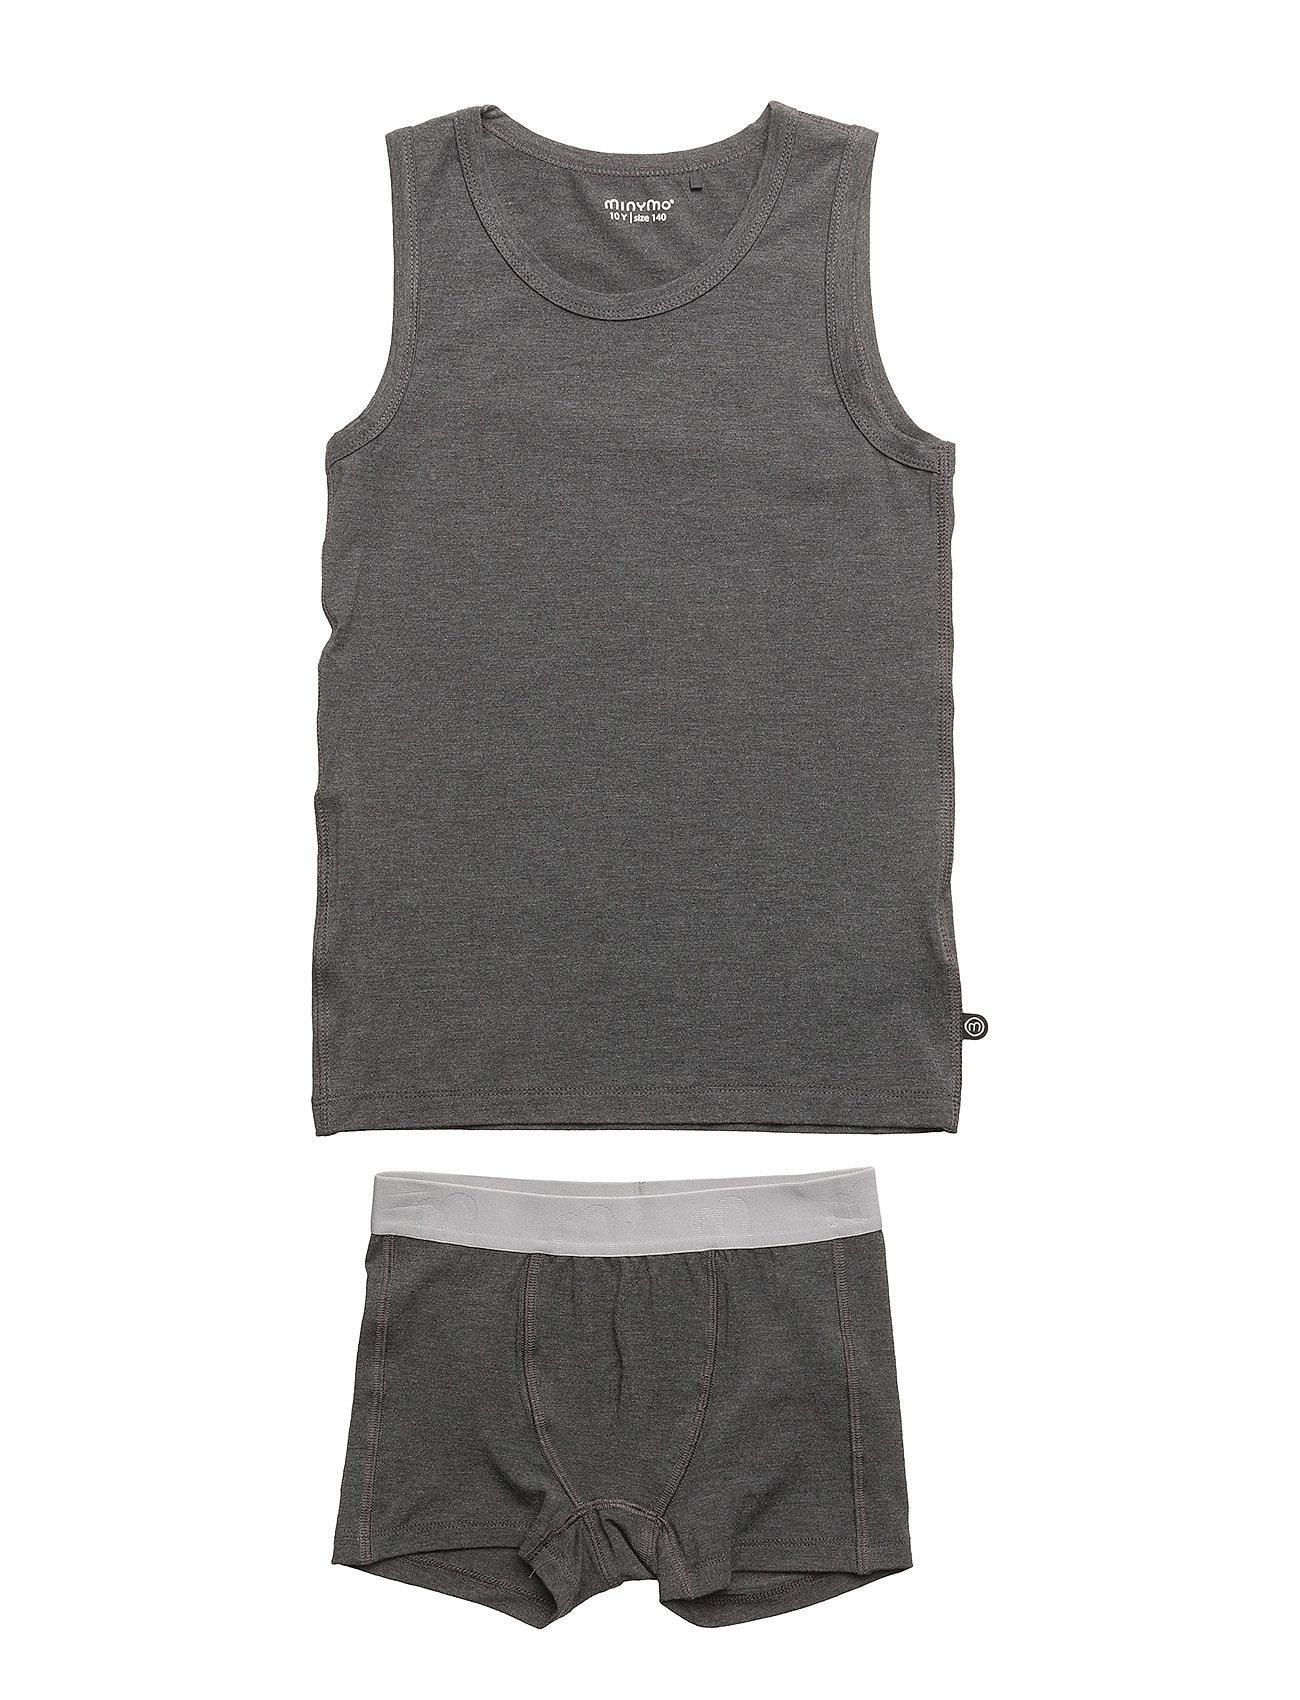 Minymo Underwear set - Bamboo - DARK GREY MELANGE